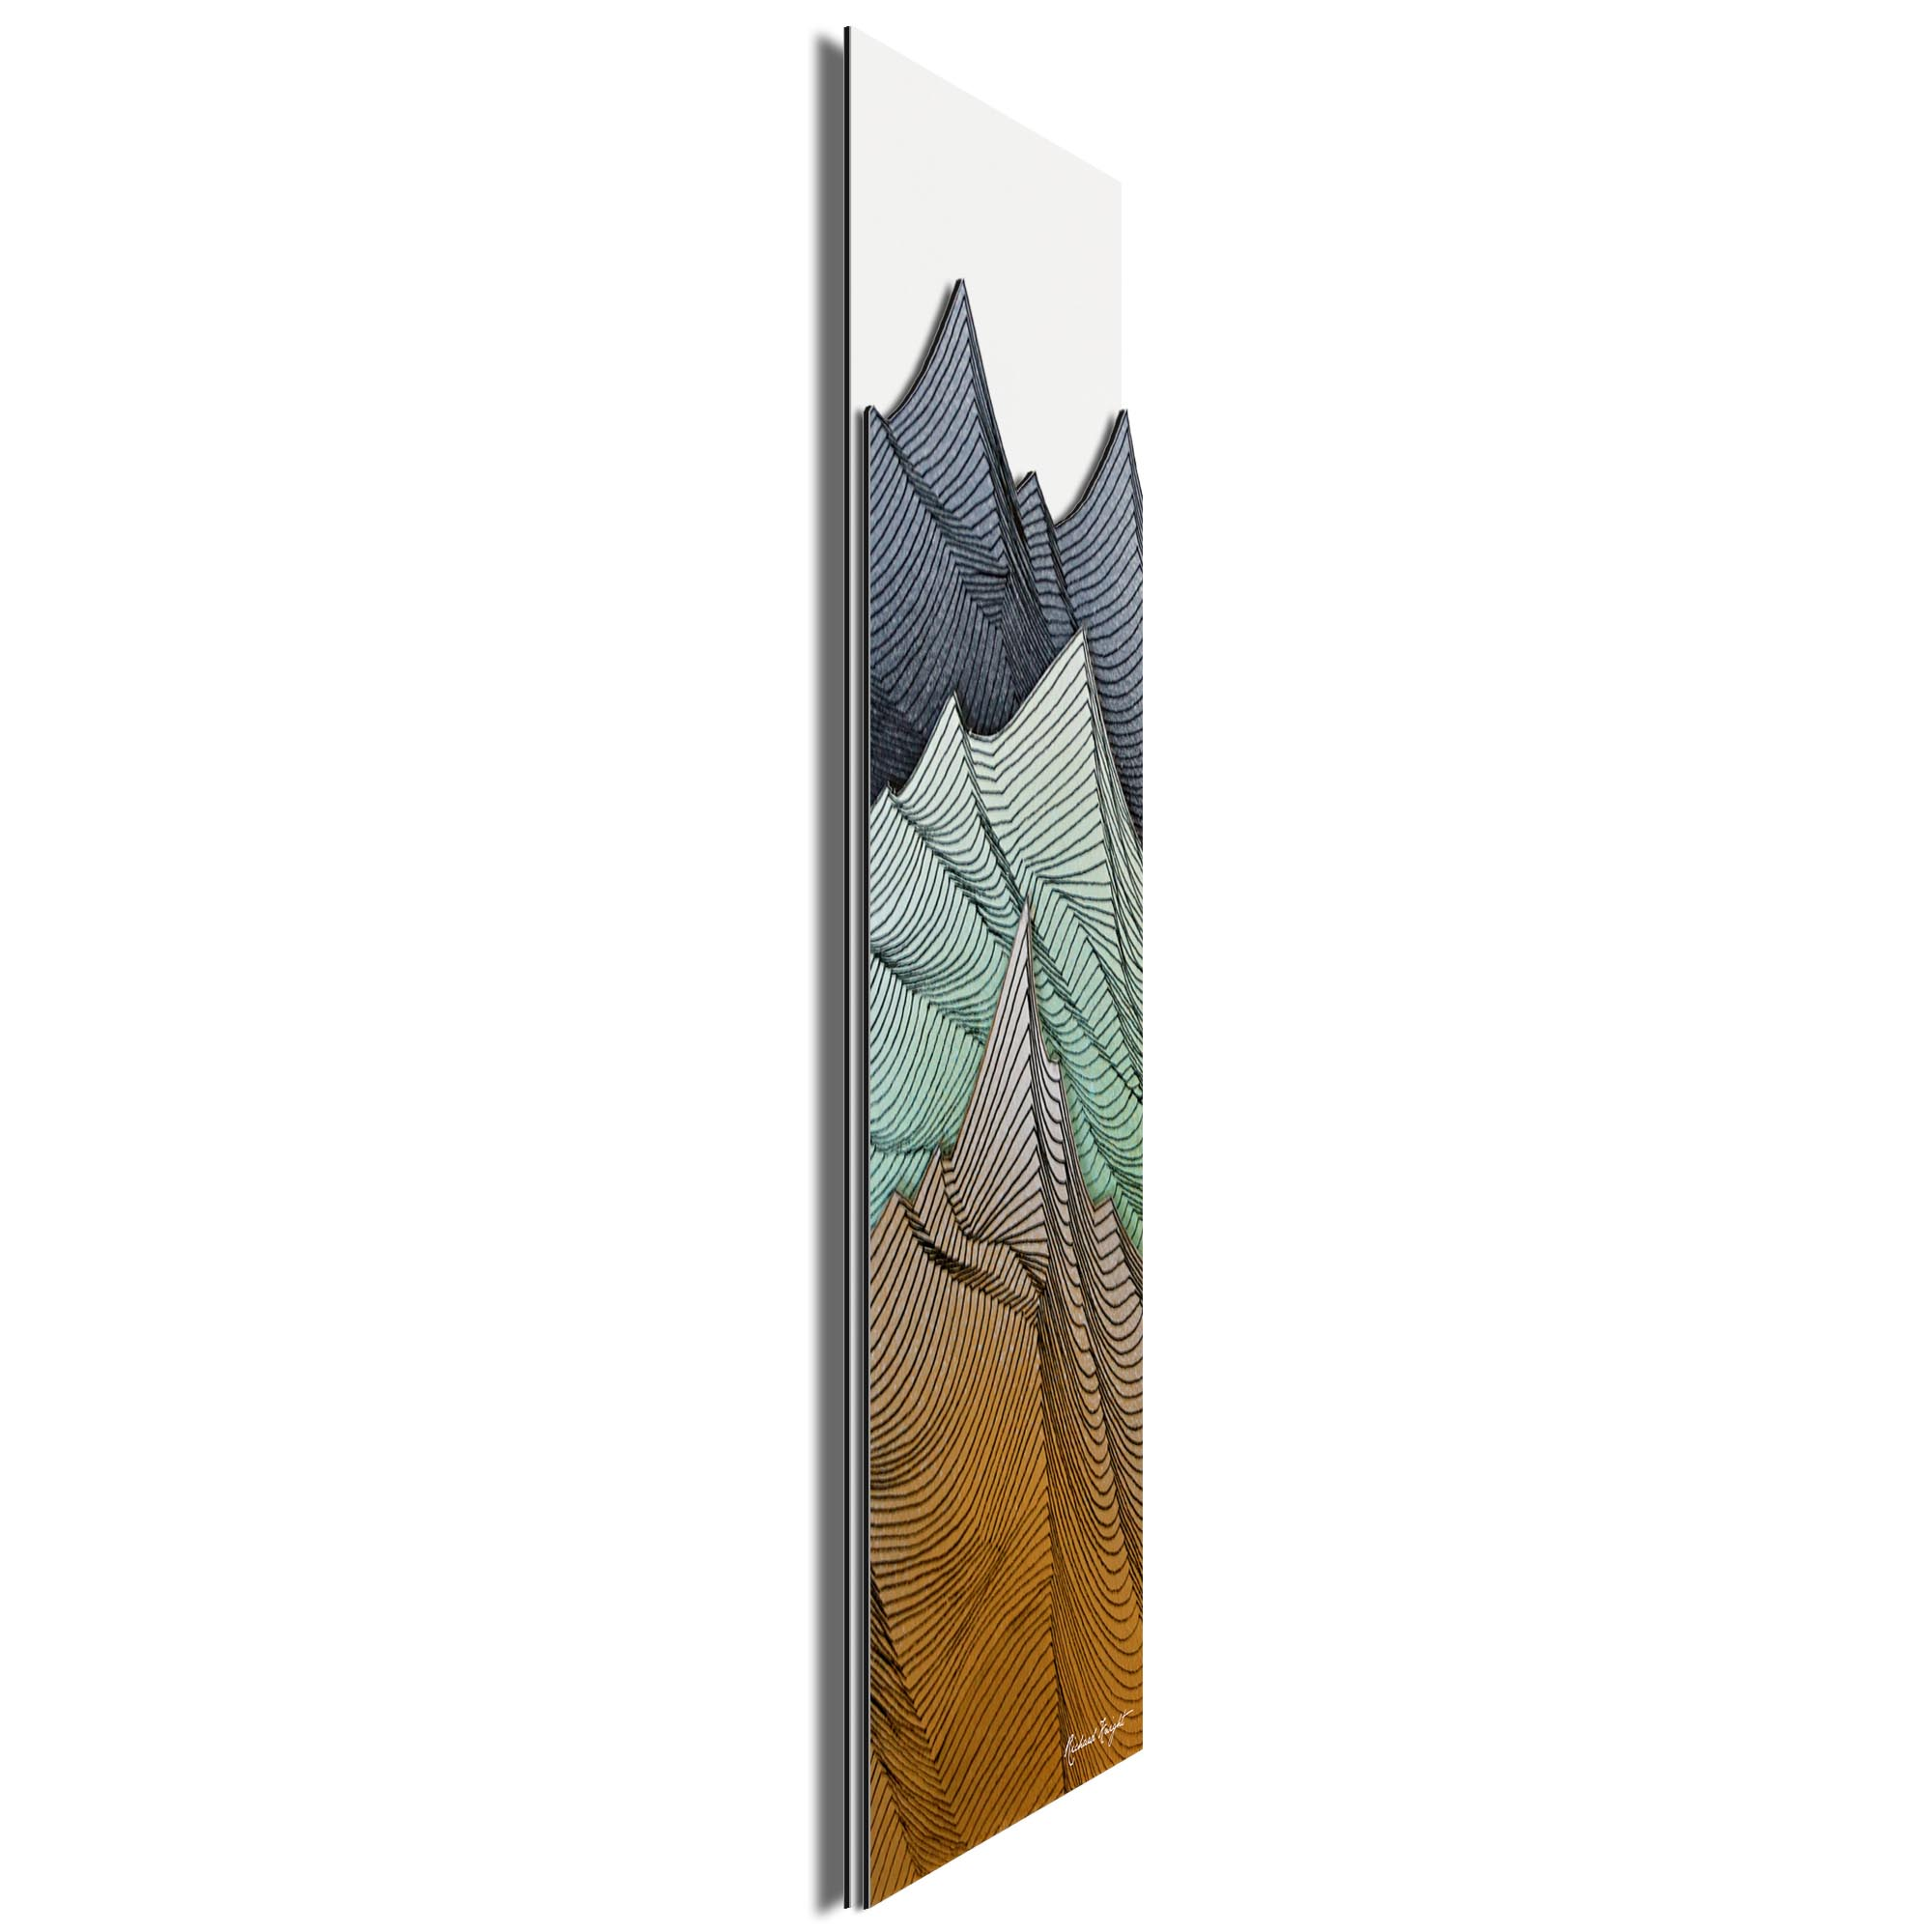 Earth Peaks by Richard Knight - Ltd. Ed. Minimalist Abstract Landscape Art - Image 2